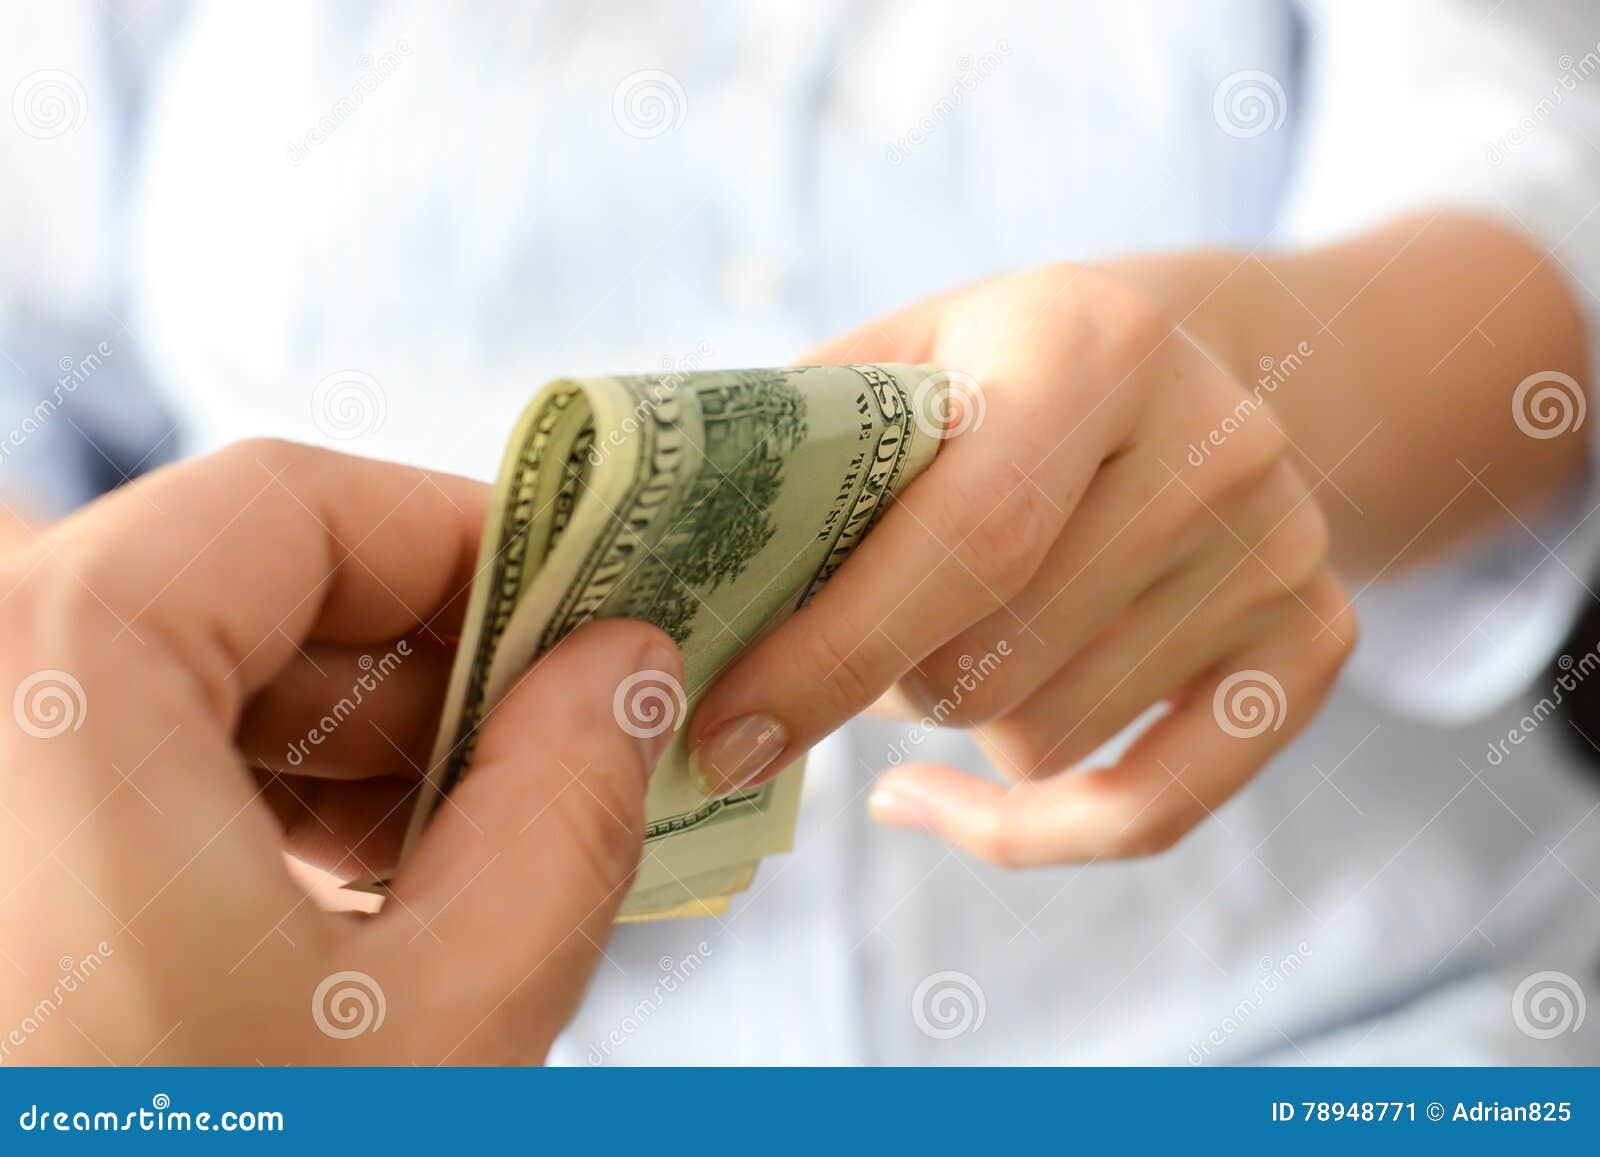 How to Bribe Someone How to Bribe Someone new pics